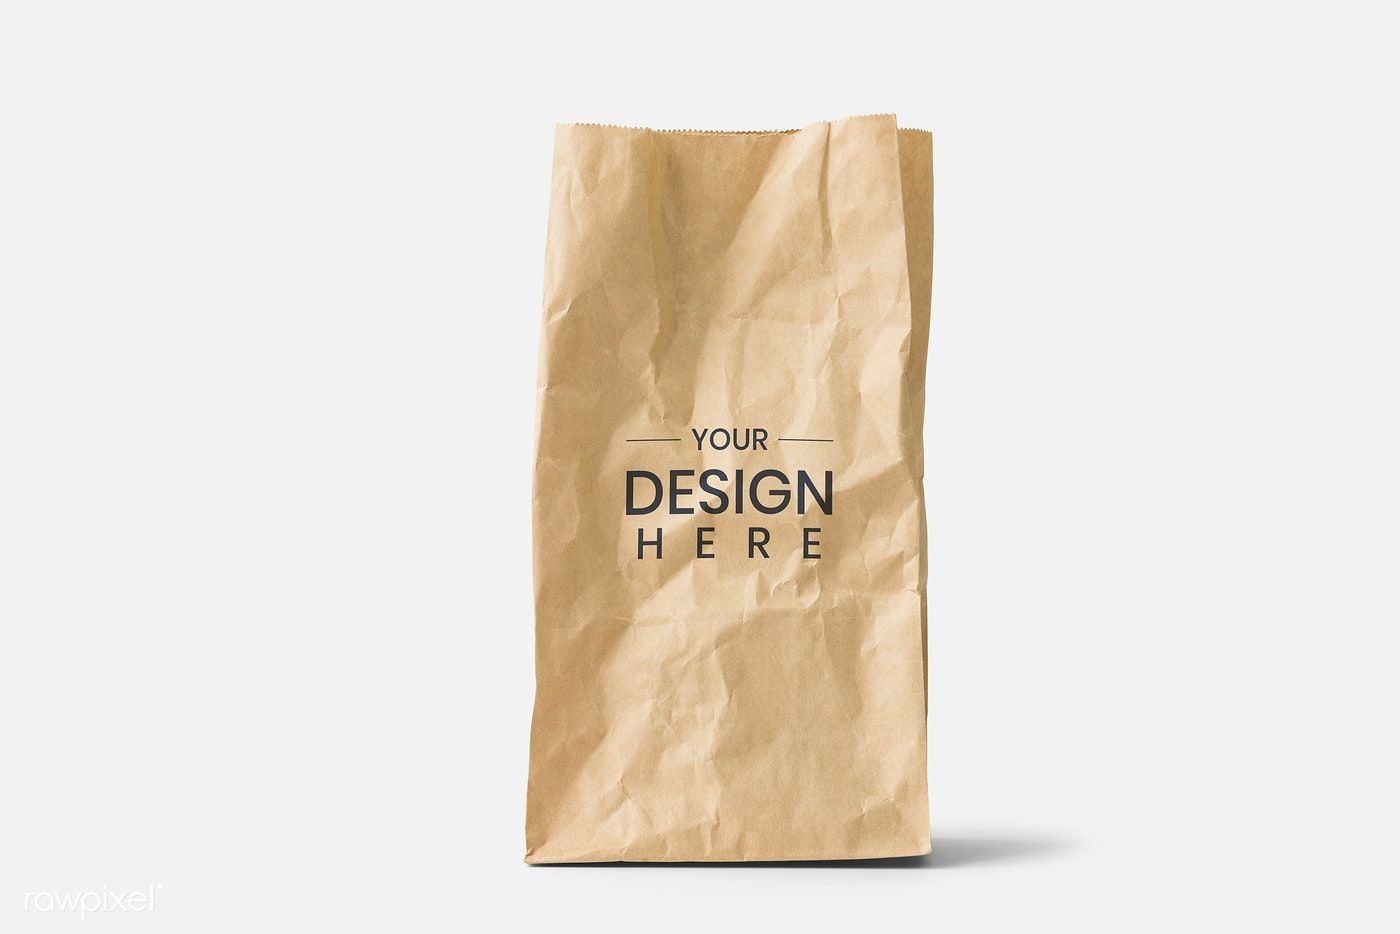 Download Download Premium Psd Of Brown Paper Bag Mockup On A White Background 844062 Paper Bag Bag Mockup Brown Paper Bag